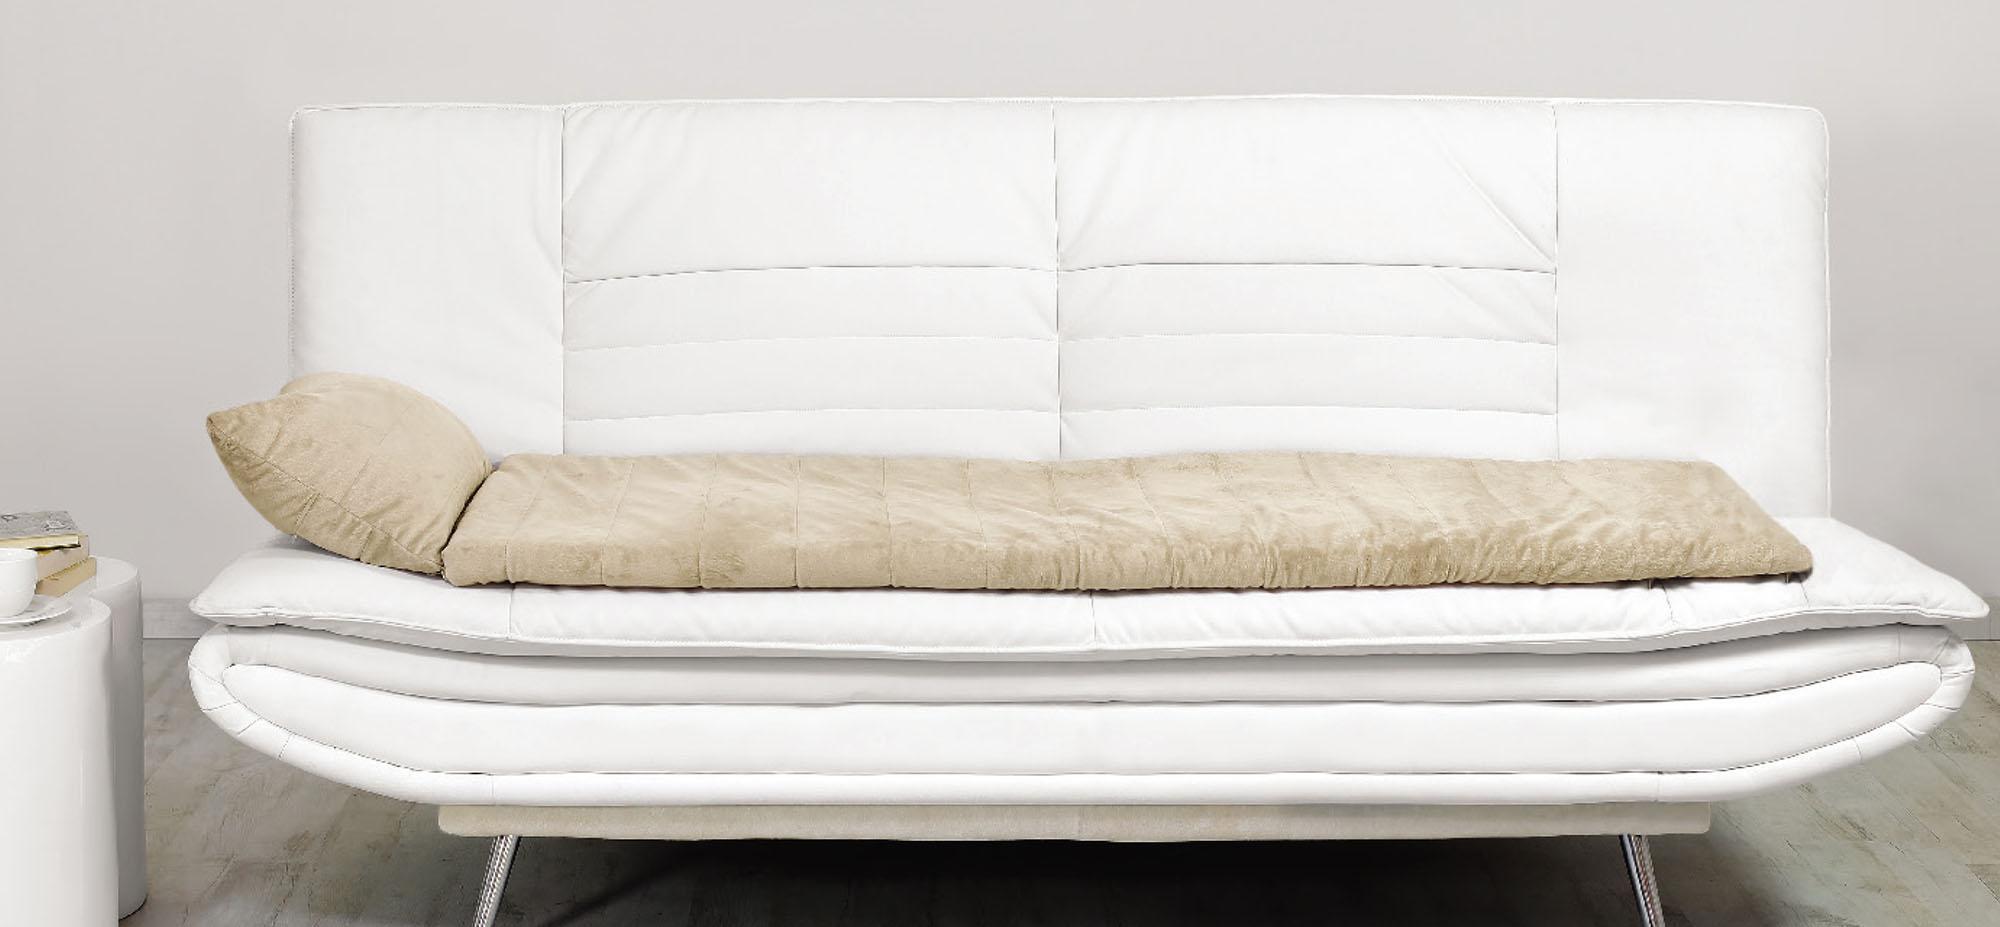 Чистый белый диван